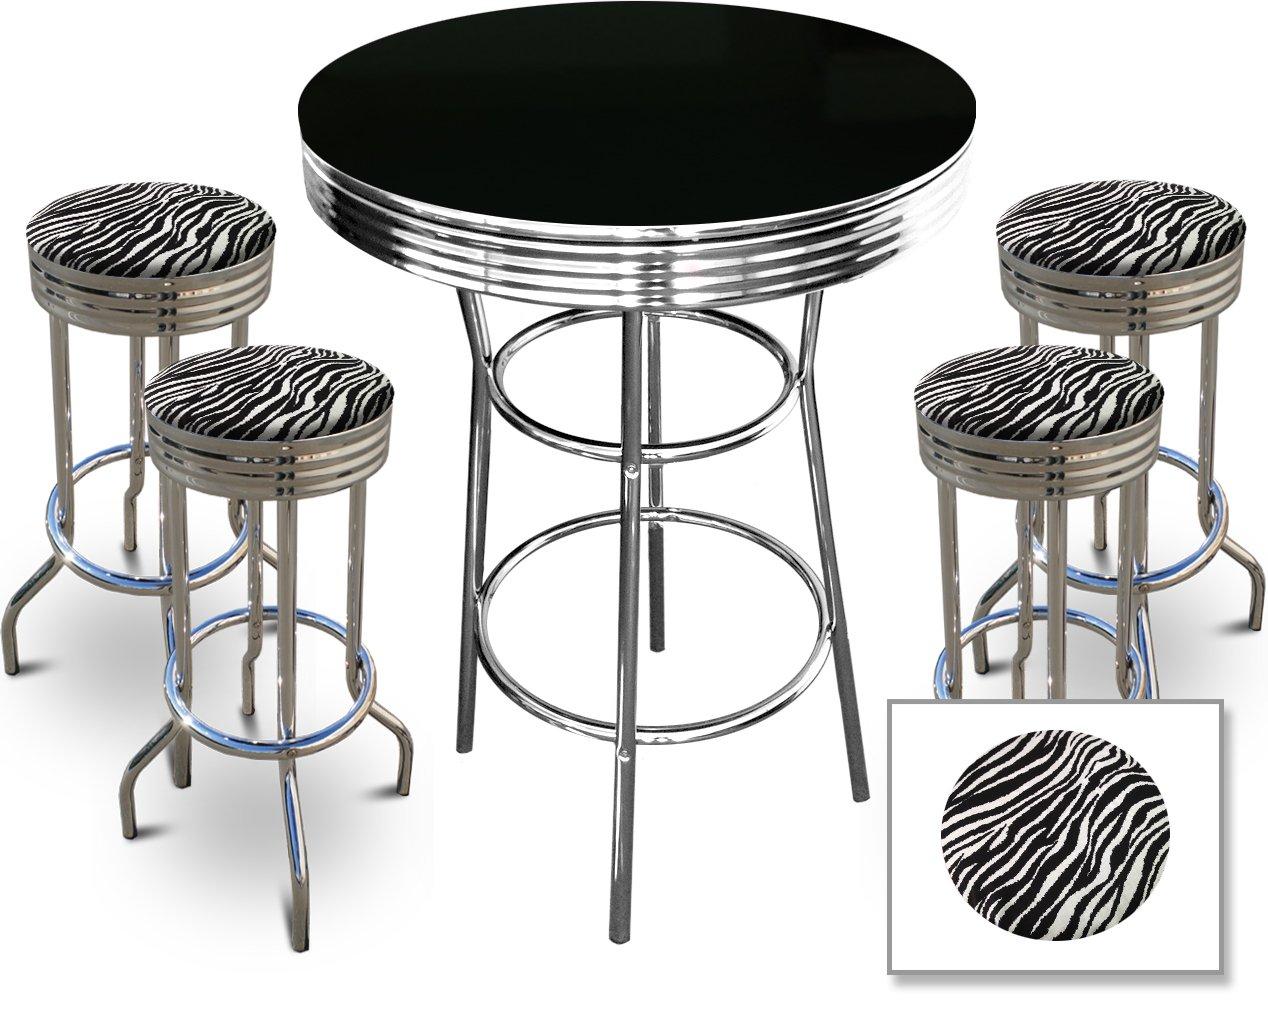 Amazon.com: 4 Zebra Print Barstools and Black Table Set: Kitchen ...